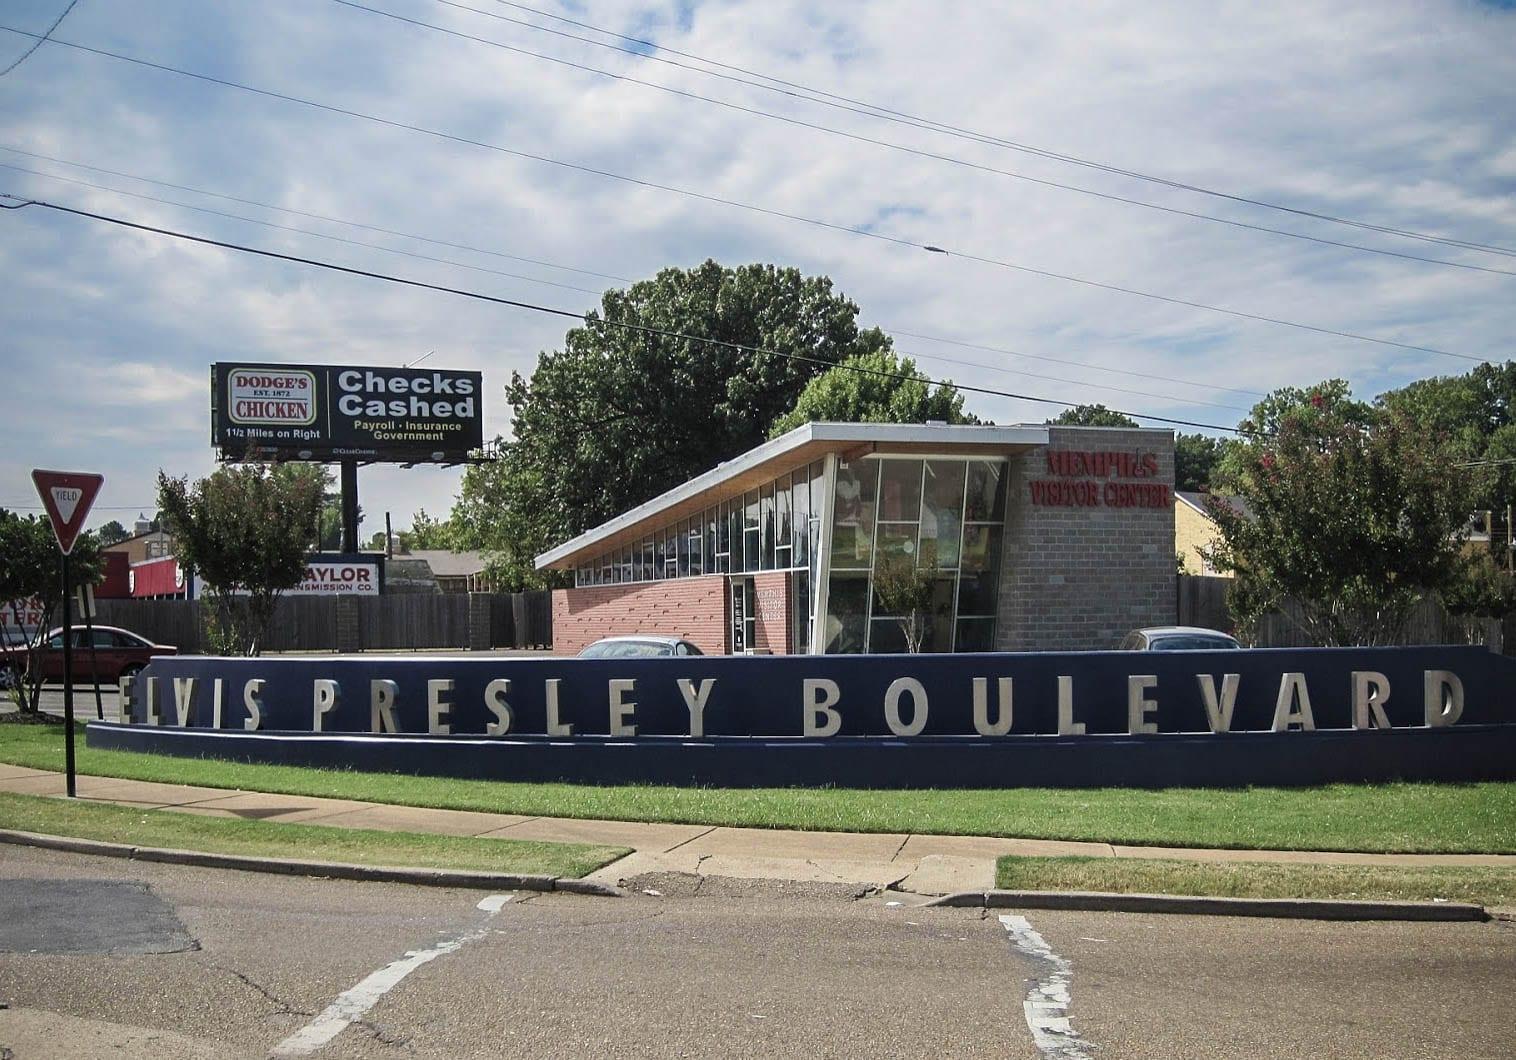 Elvis Presley Boulevard em Memphis